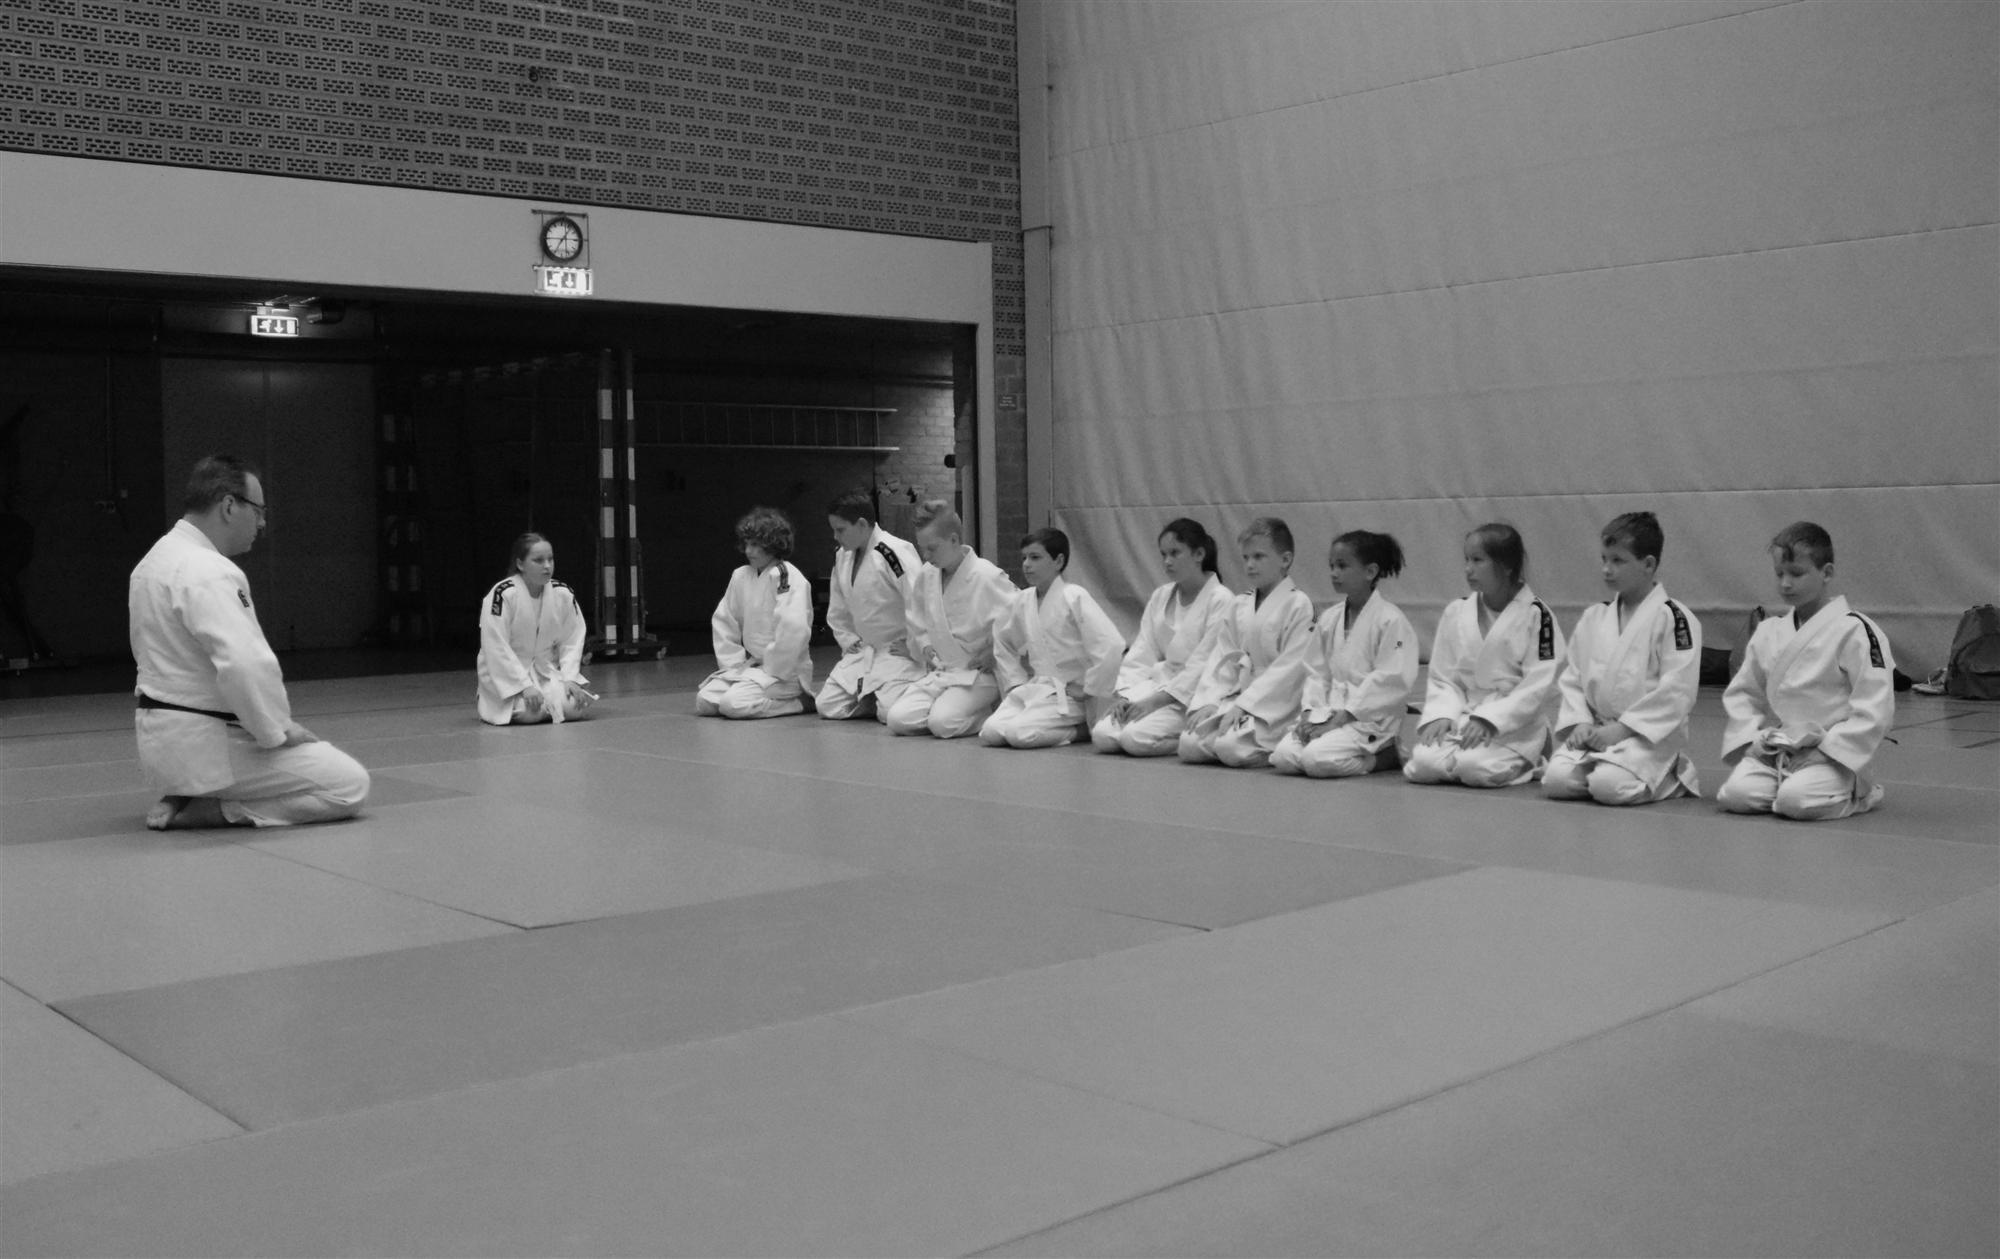 http://judoclubbrunssum.nl/en/iw-courses/m1/